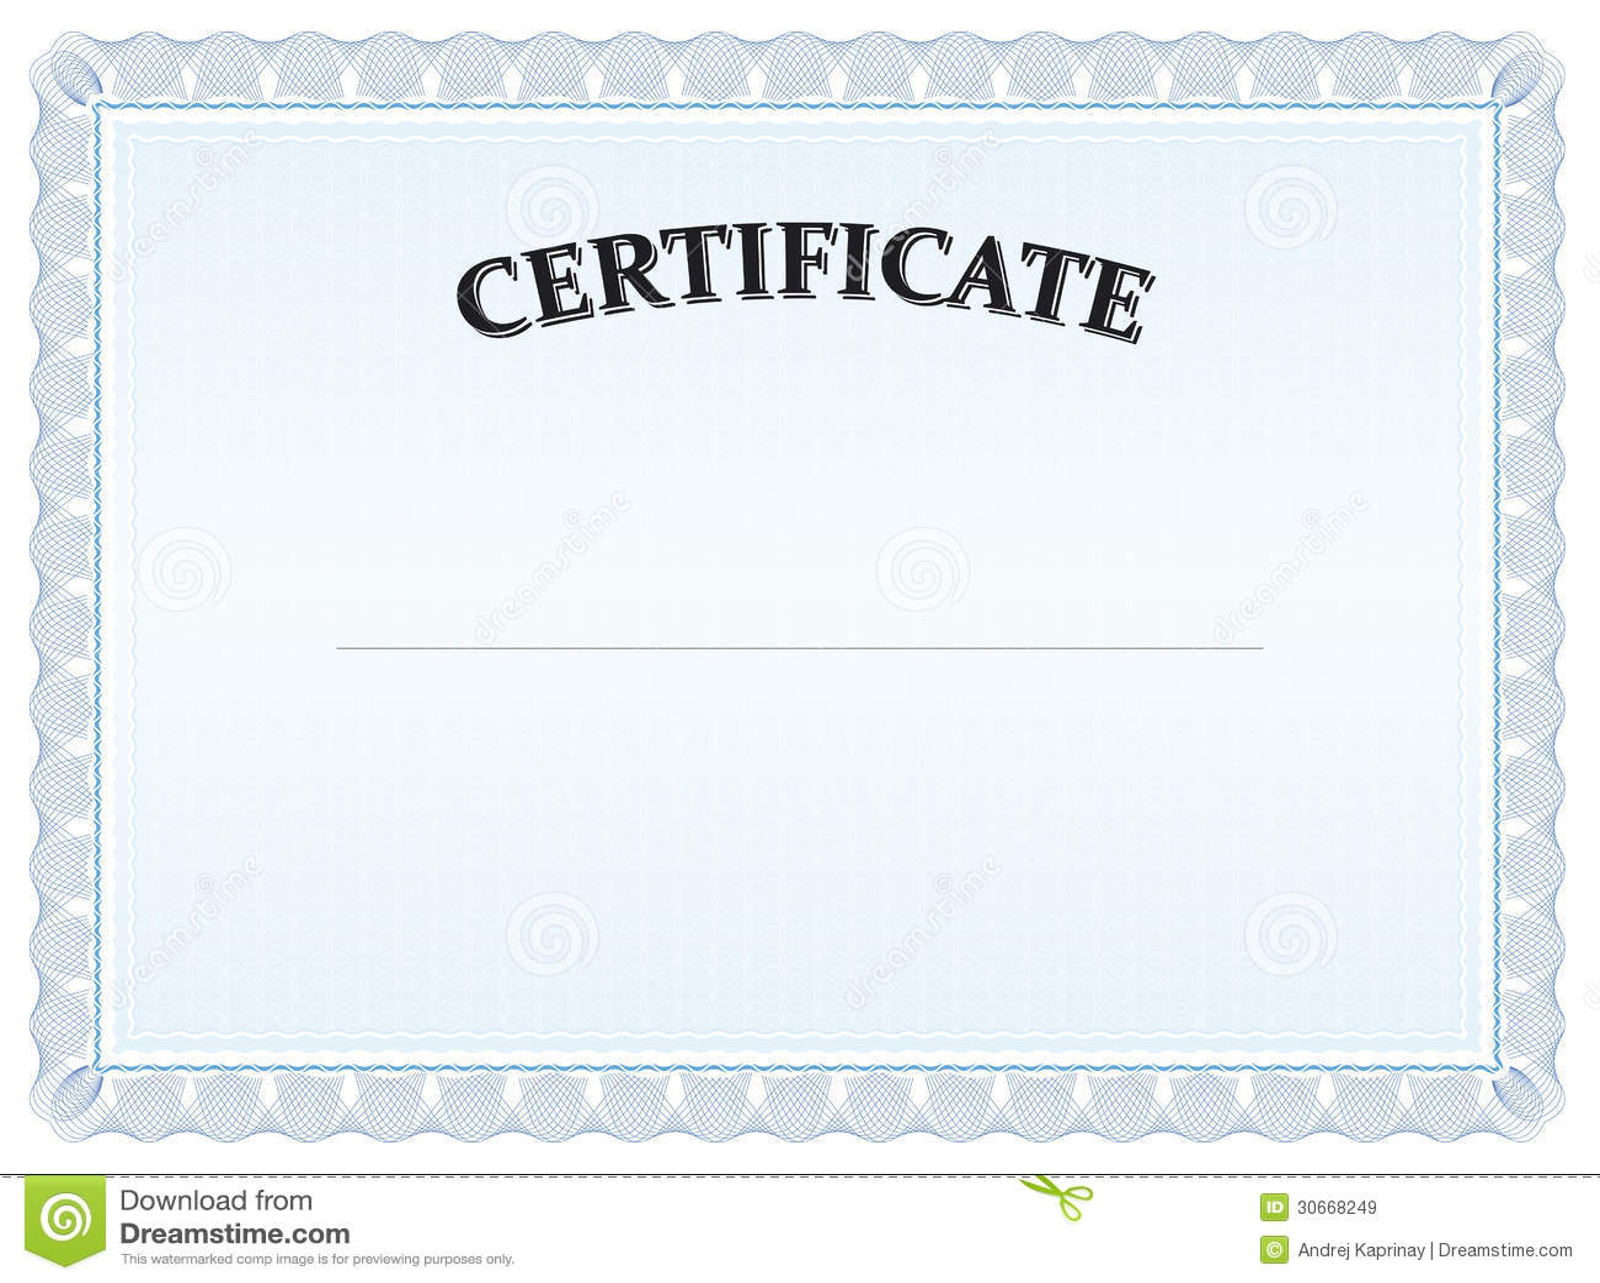 blue certificate graduate diploma stock vector image  blue certificate graduate diploma